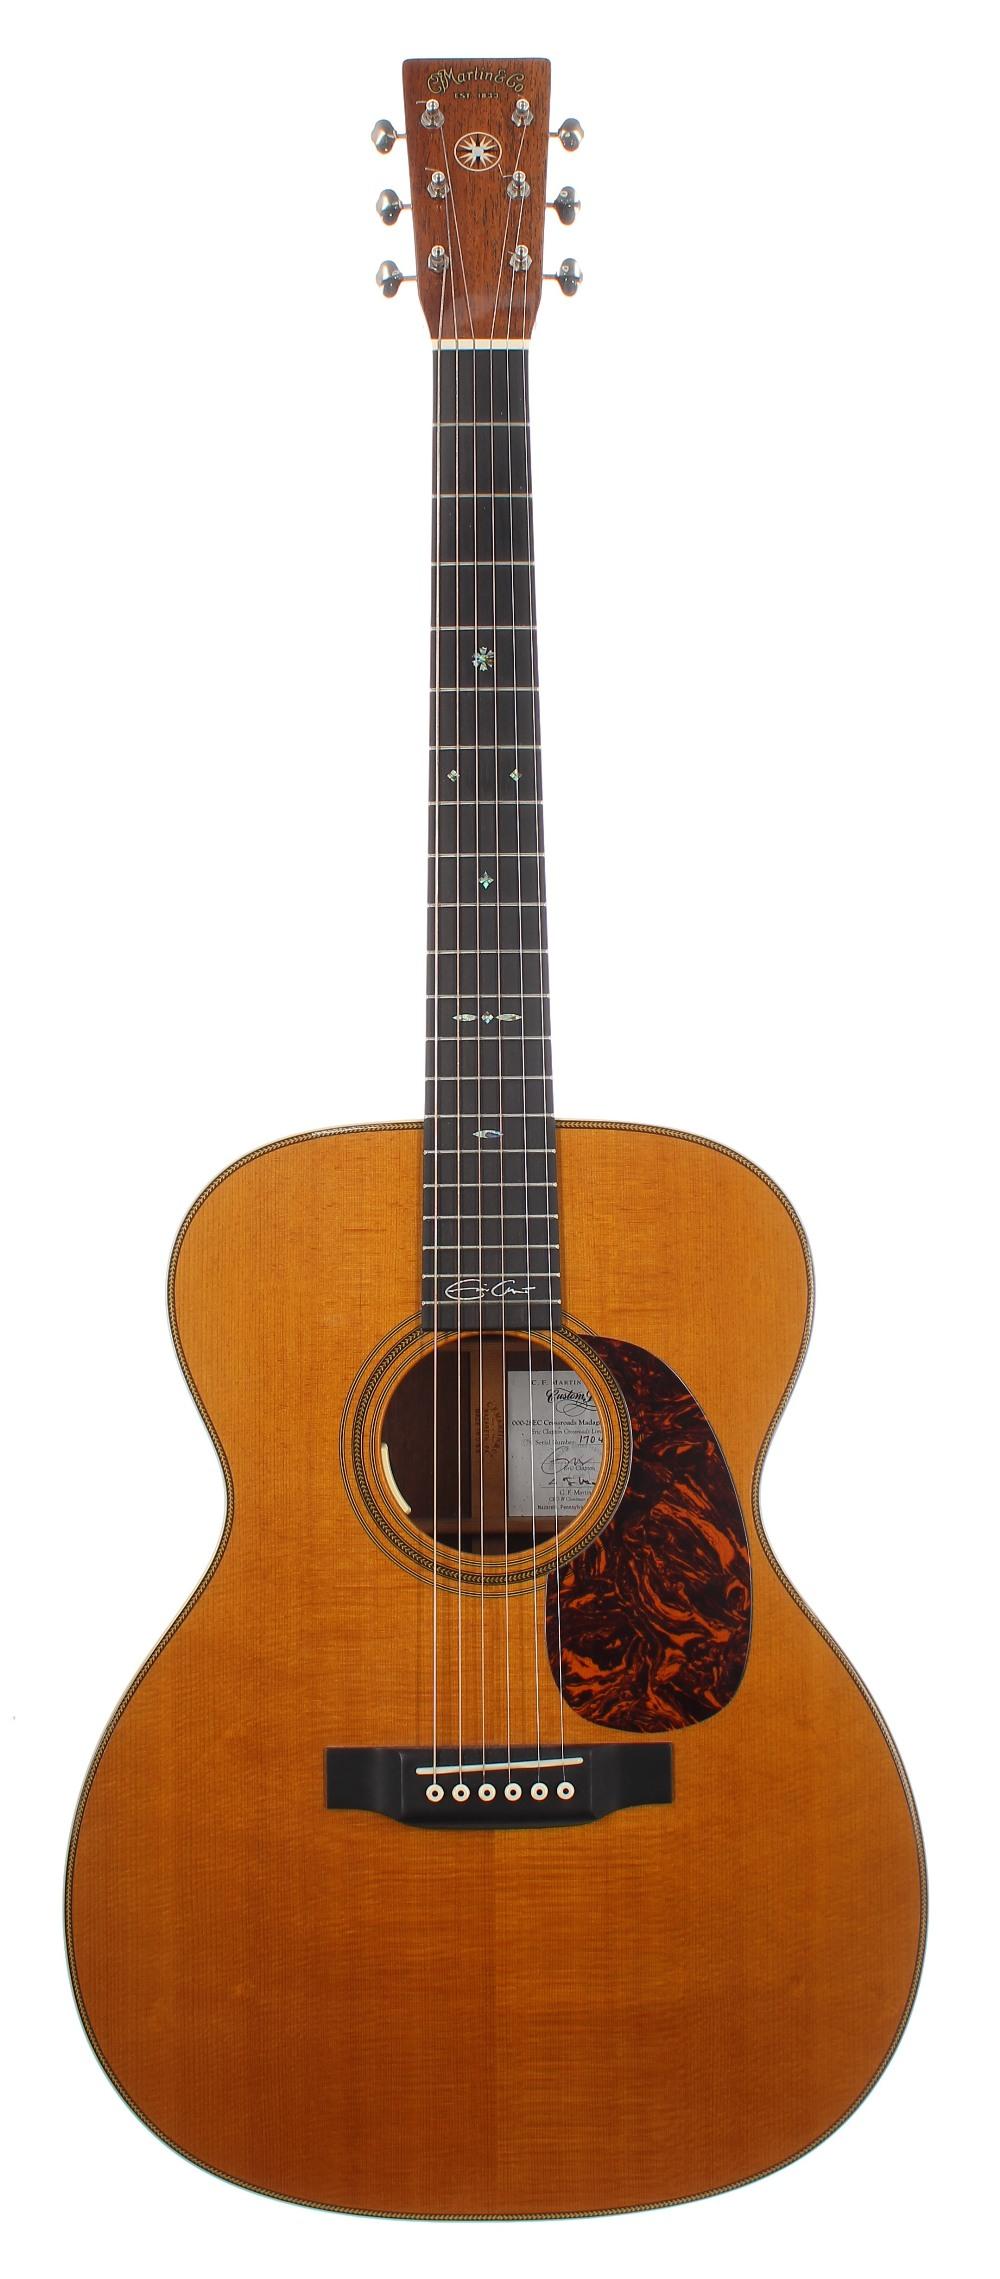 2013 C.F. Martin & Co Custom Shop Eric Clapton Crossroads limited edition 000-28EC Crossroads